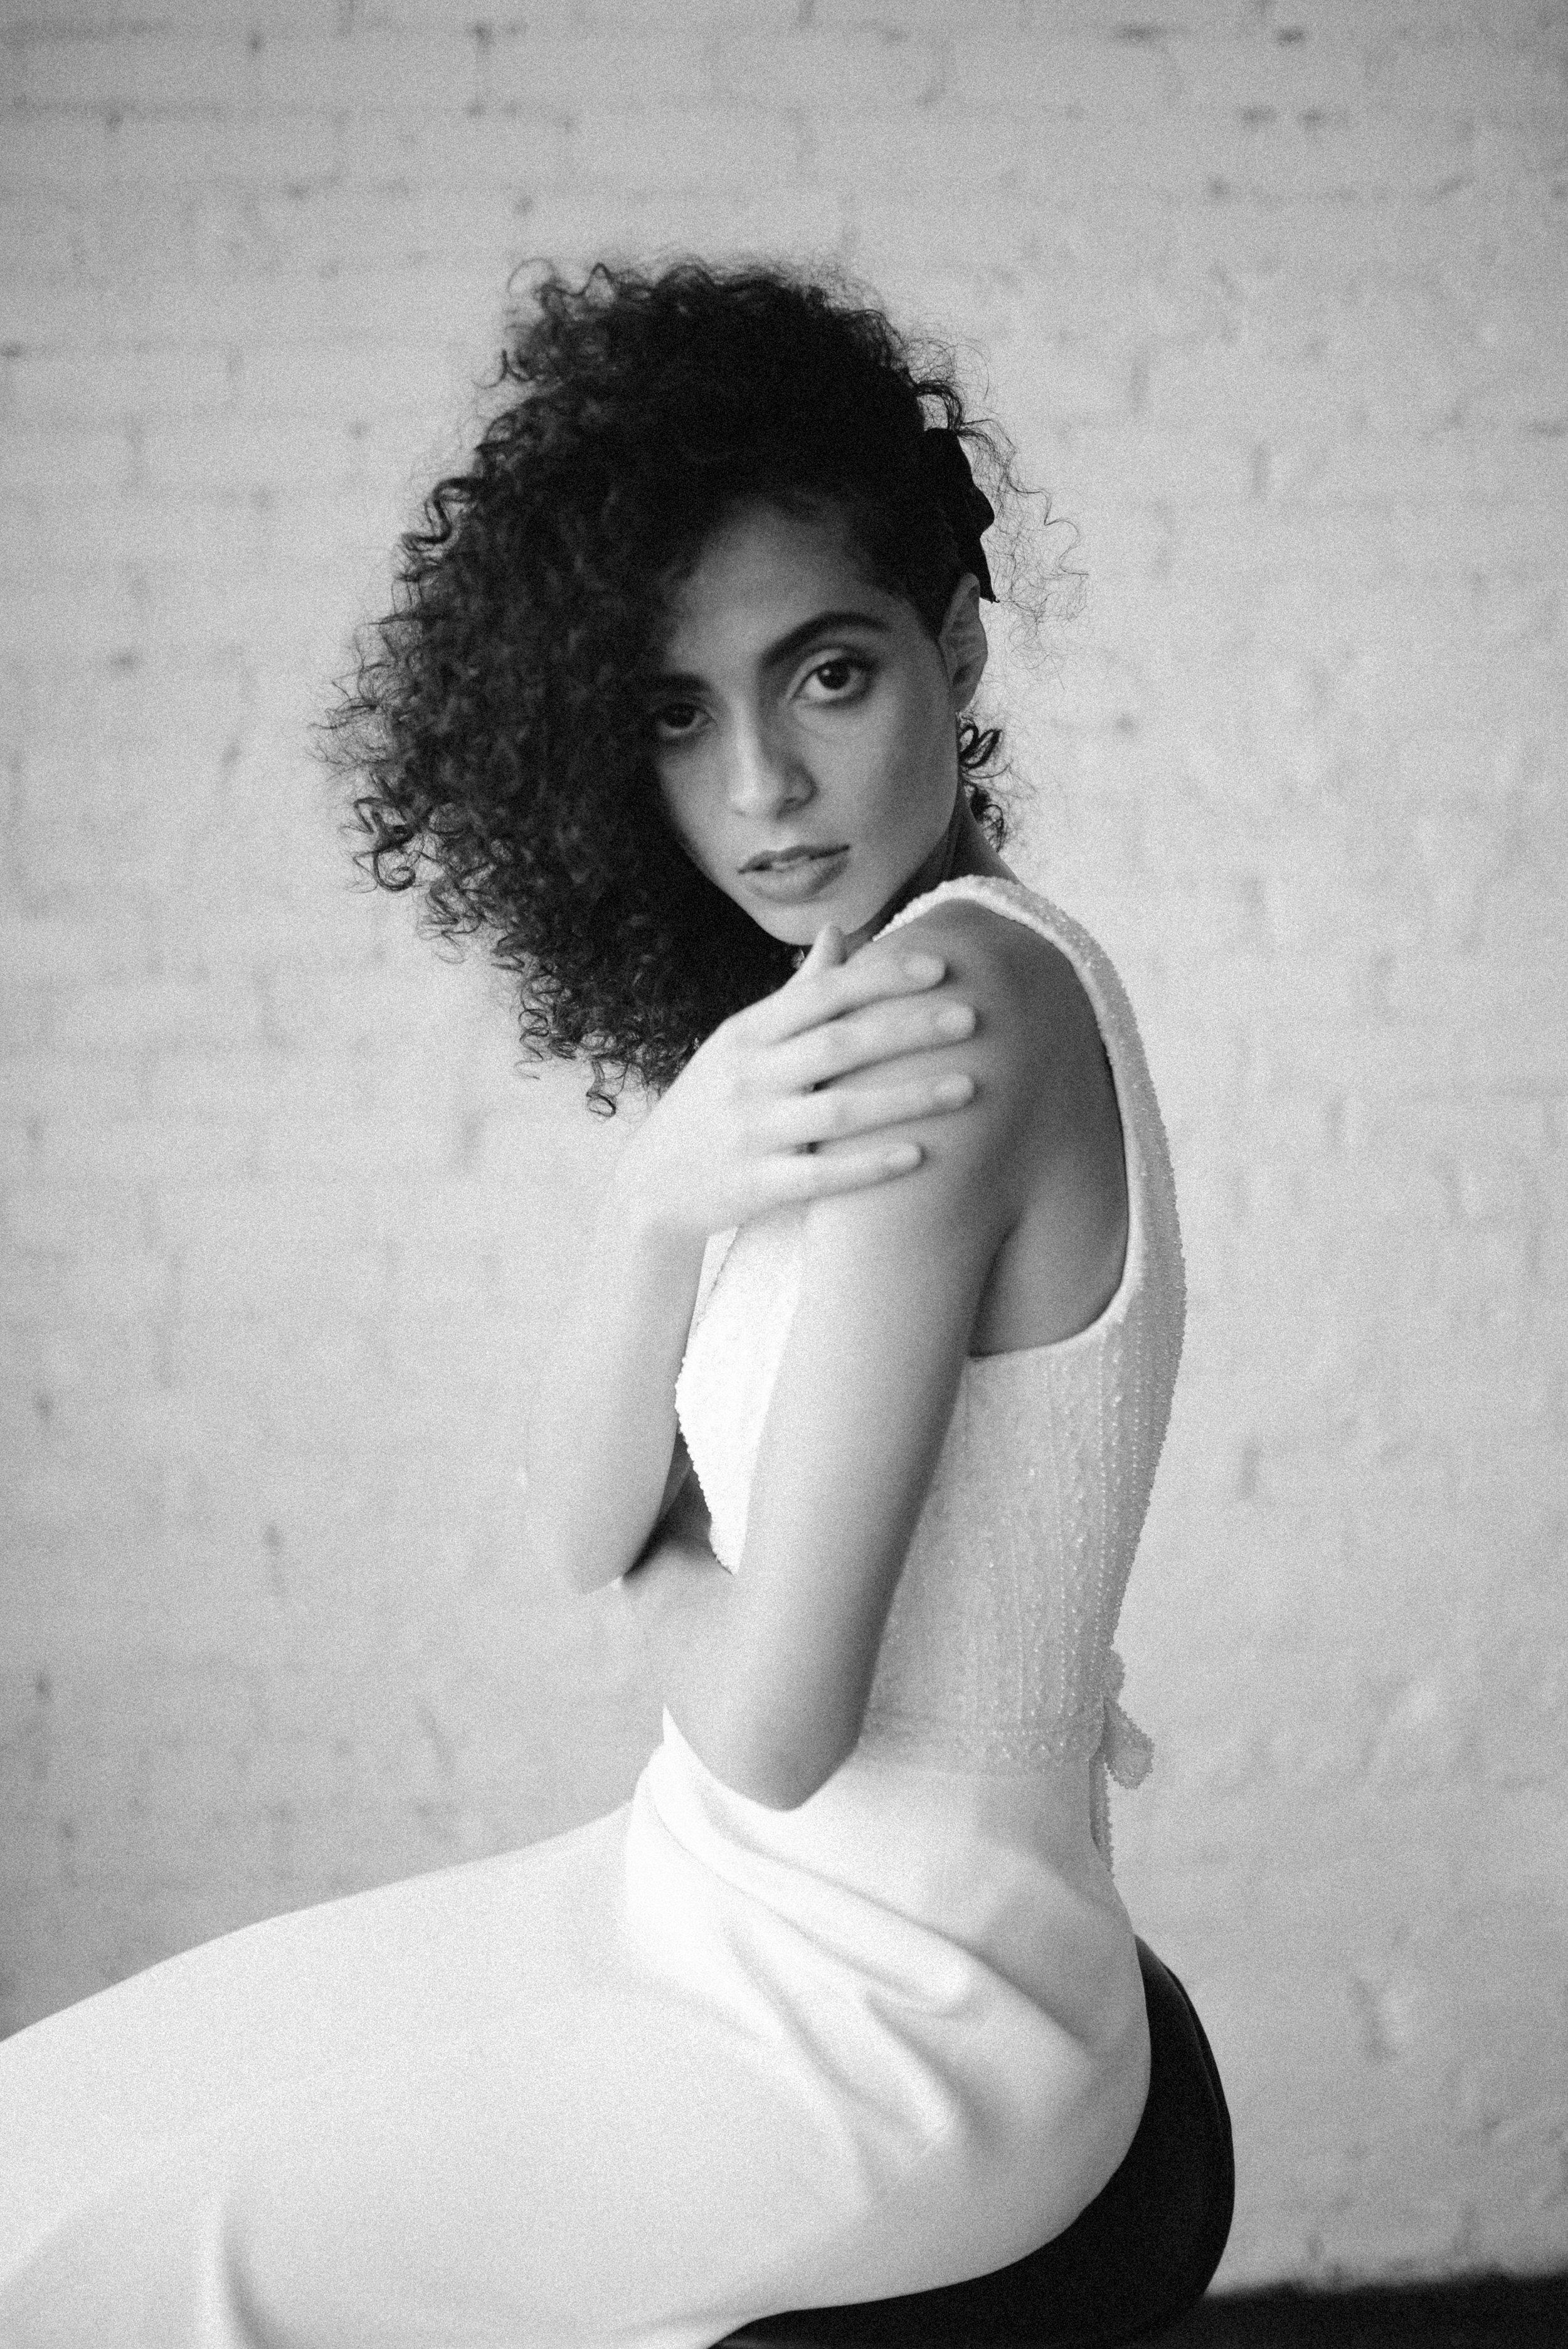 haus-820-minimal-editorial-wedding-styled-shoot-105.jpg